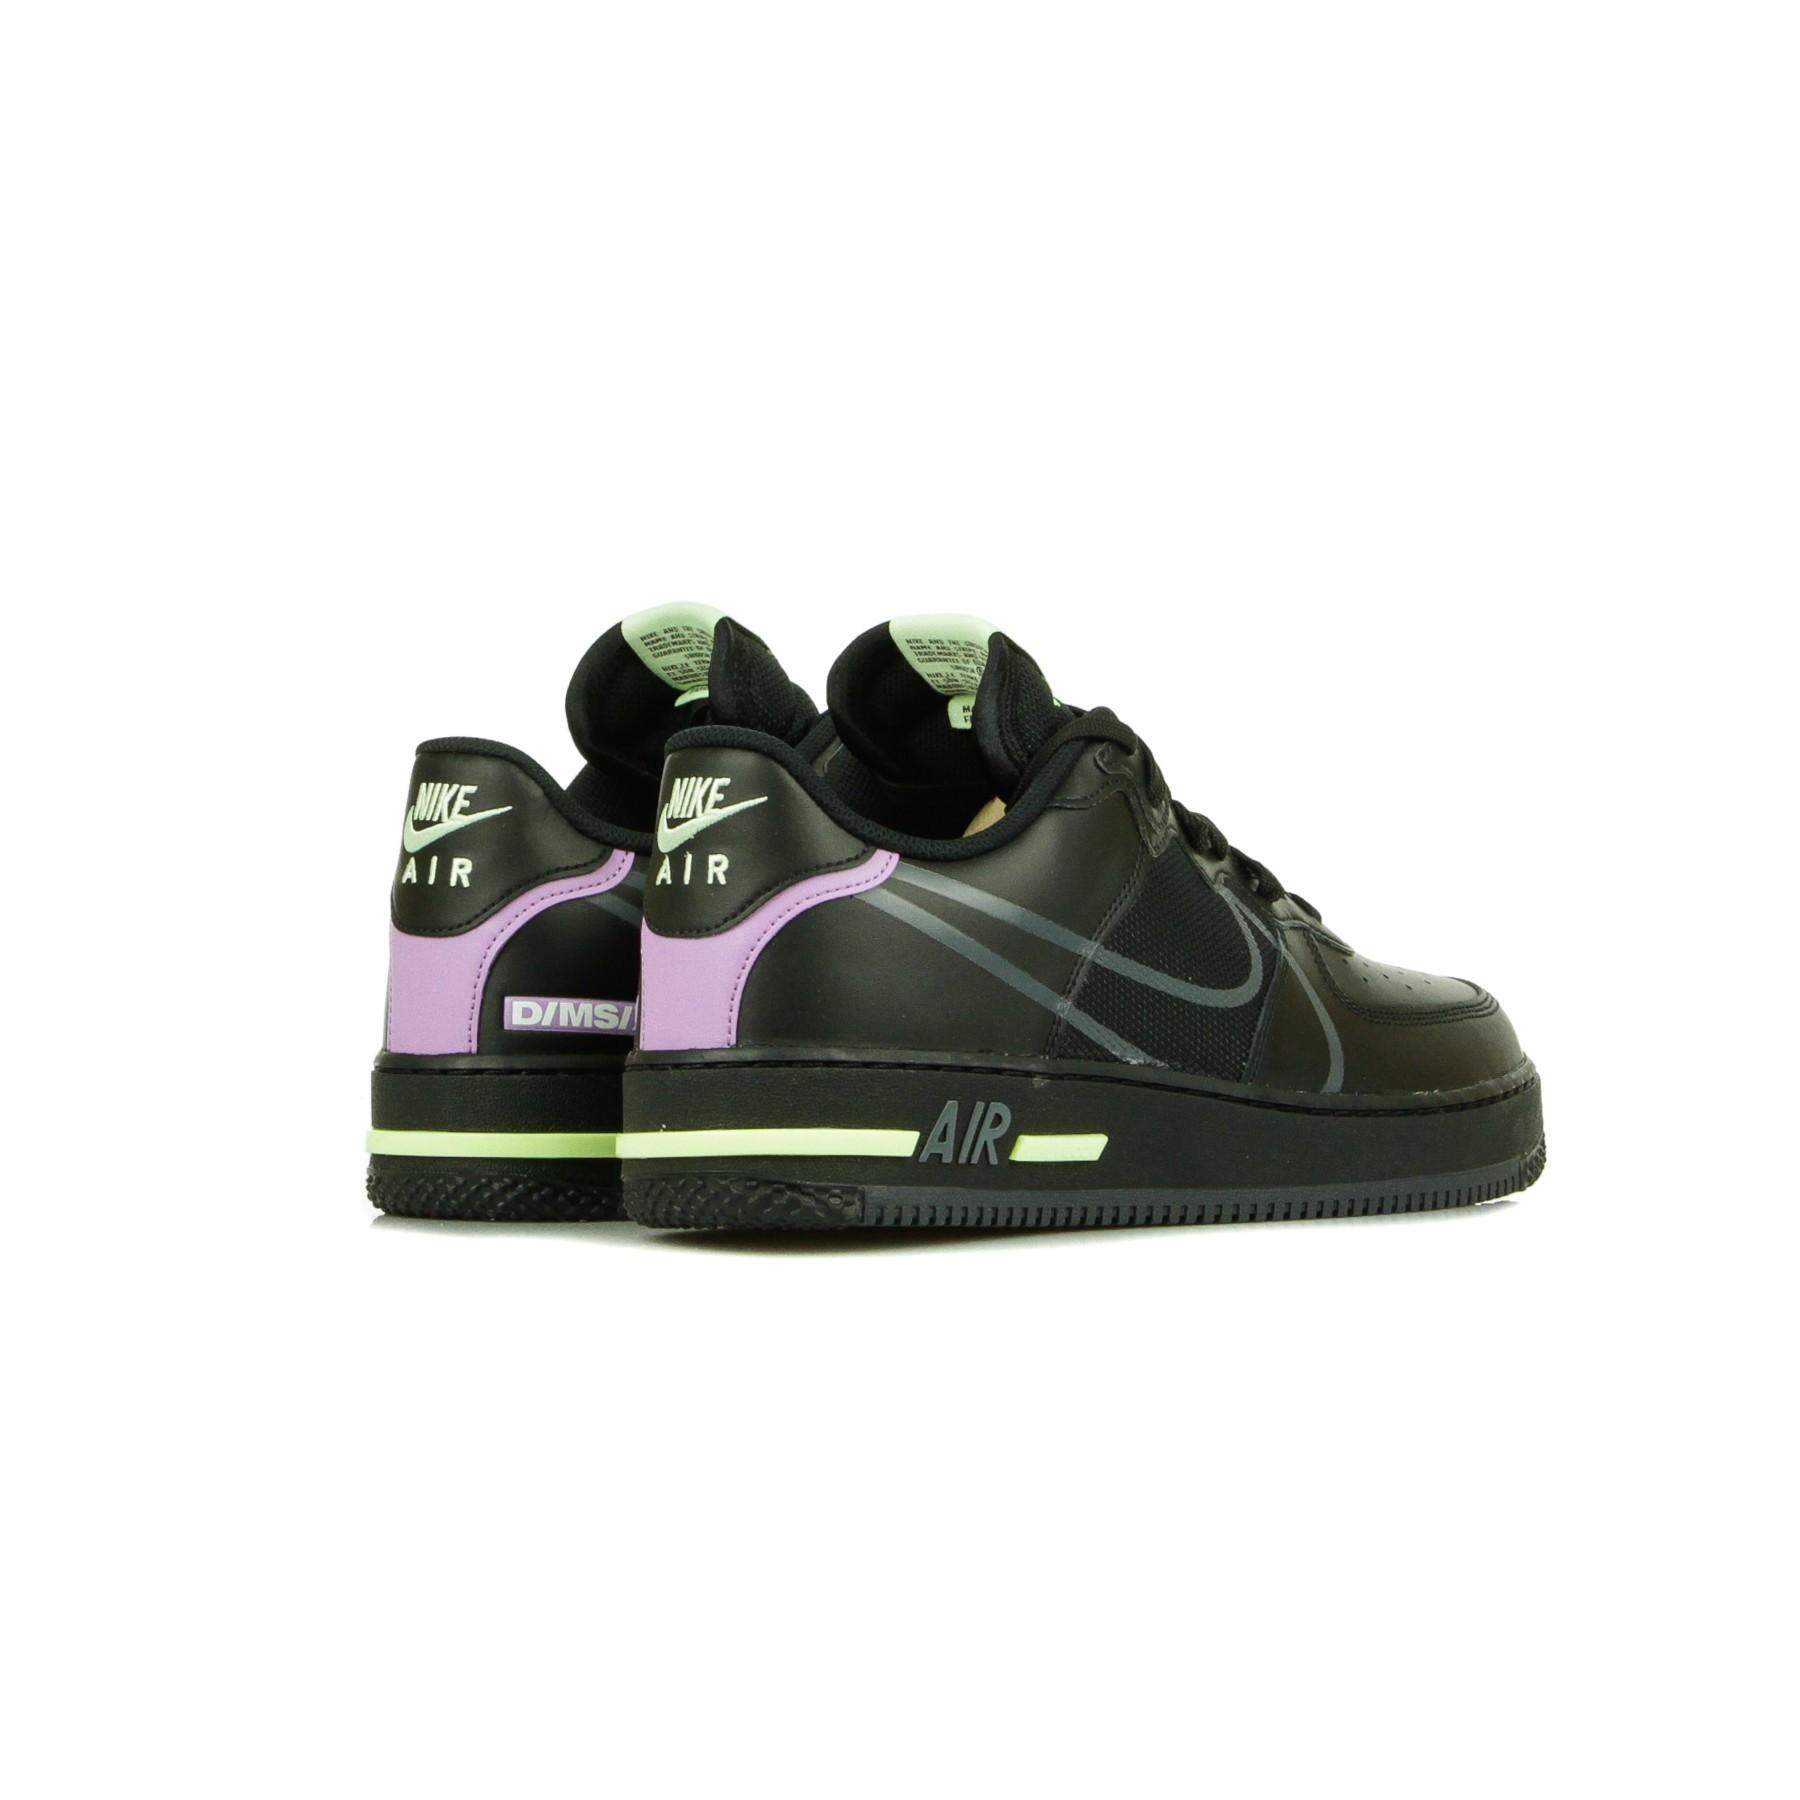 scarpa bassa uomo air force 1 react BLACK/ANTHRACITE/VIOLET STAR/BARELY VOLT